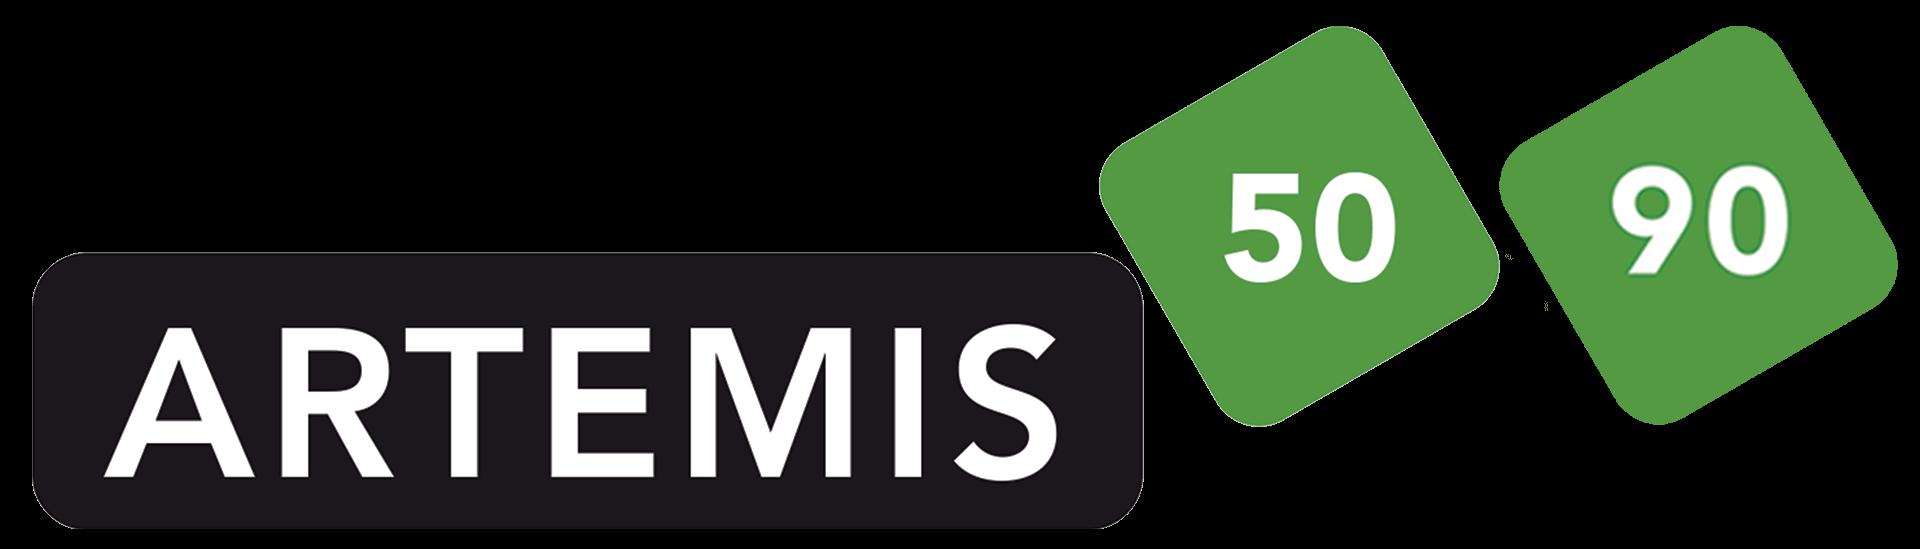 Artemis Logo Range